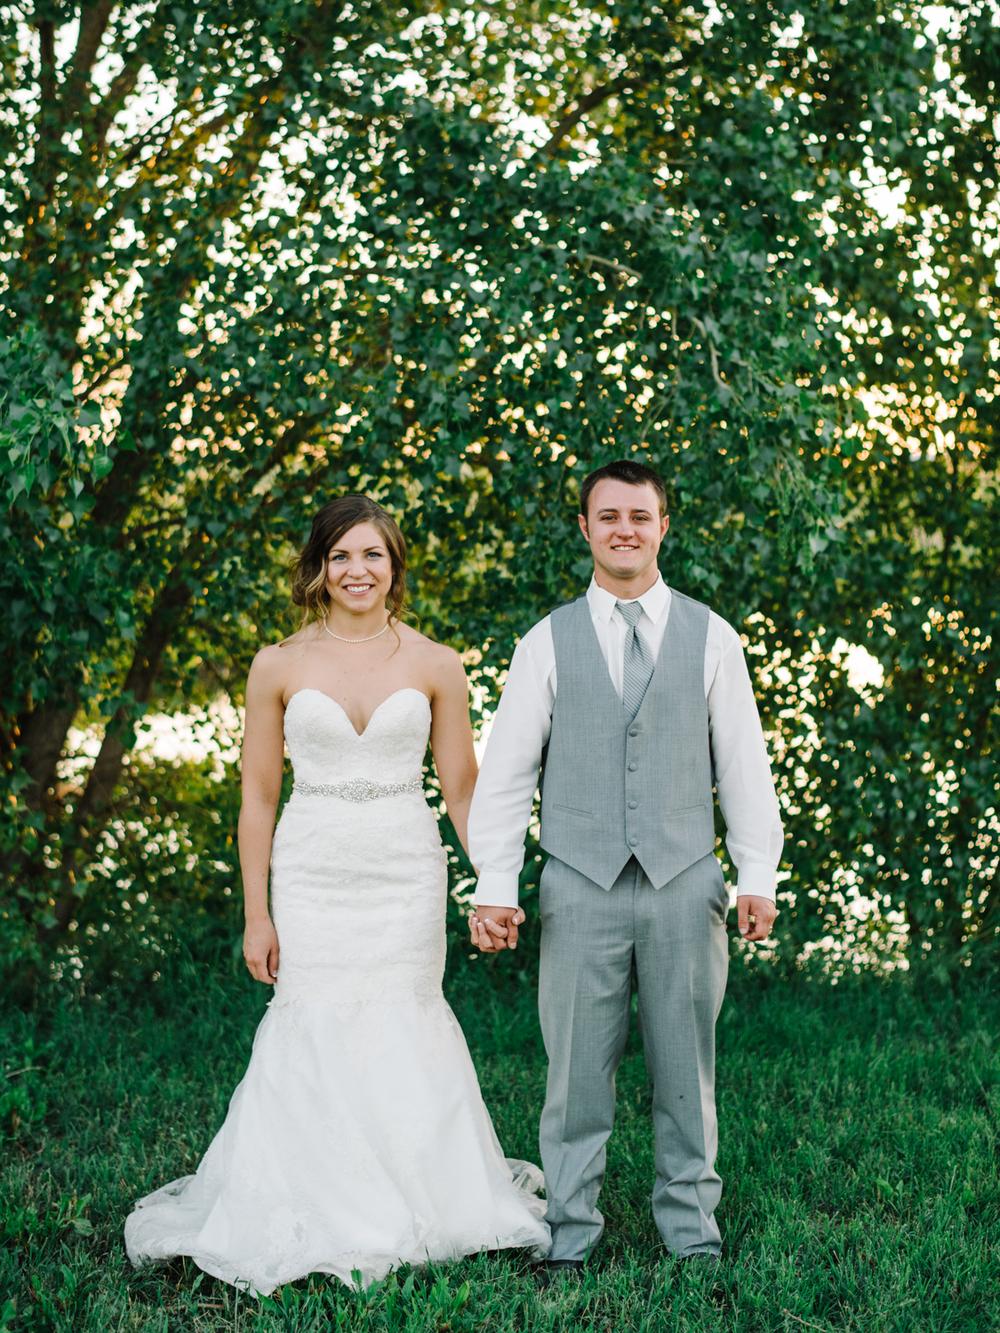 Dodge City, Kansas Wedding-Neal Dieker-Western Kansas Wedding Photographer-Dodge City, Kansas Wedding Photography-Wichita, Kansas Wedding Photographer-274.jpg